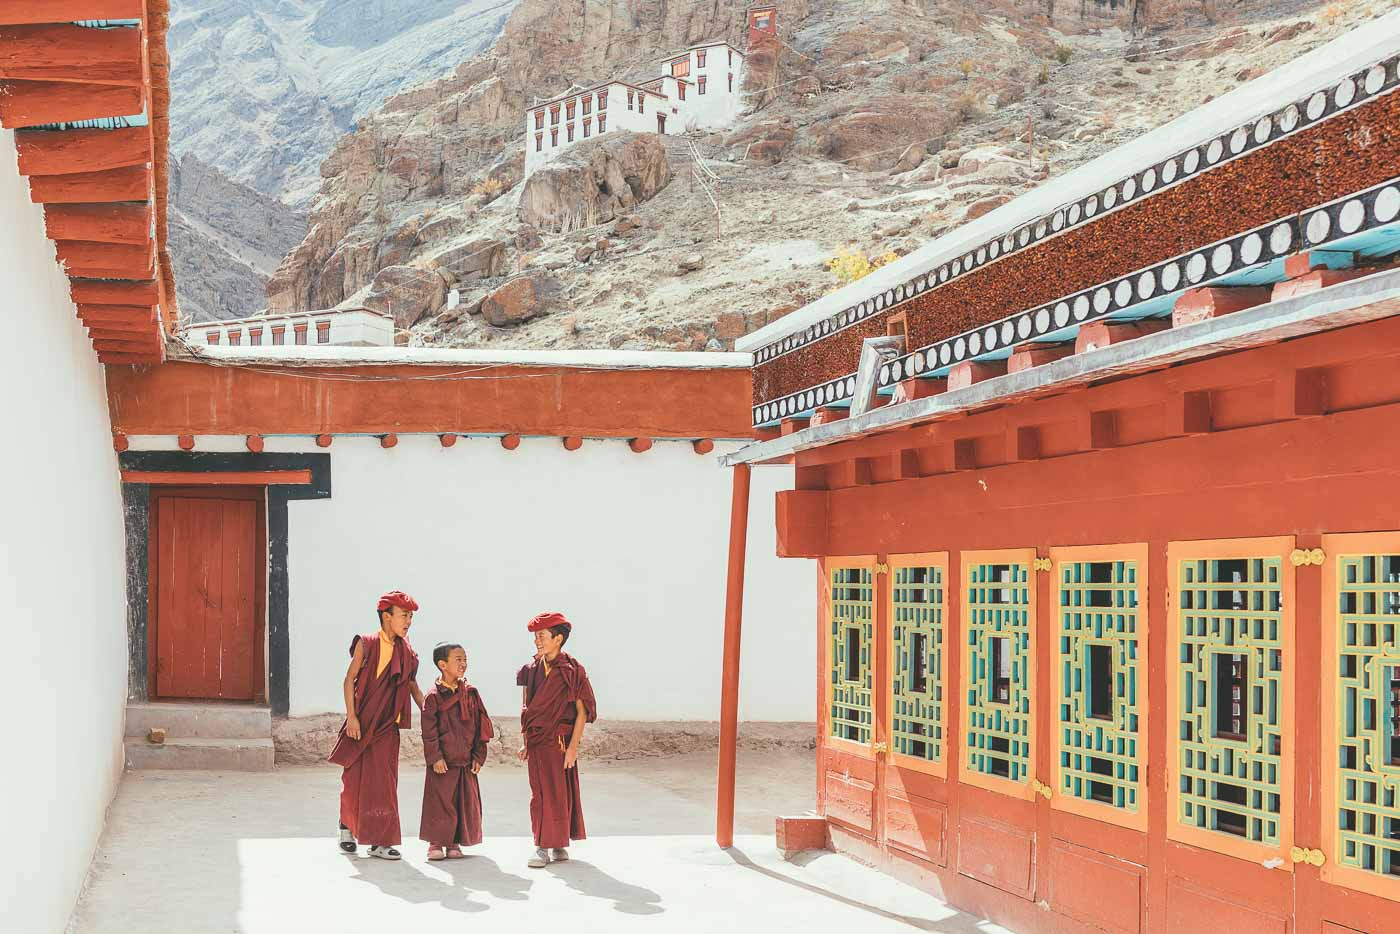 Budha in Monastery in Ladakh India